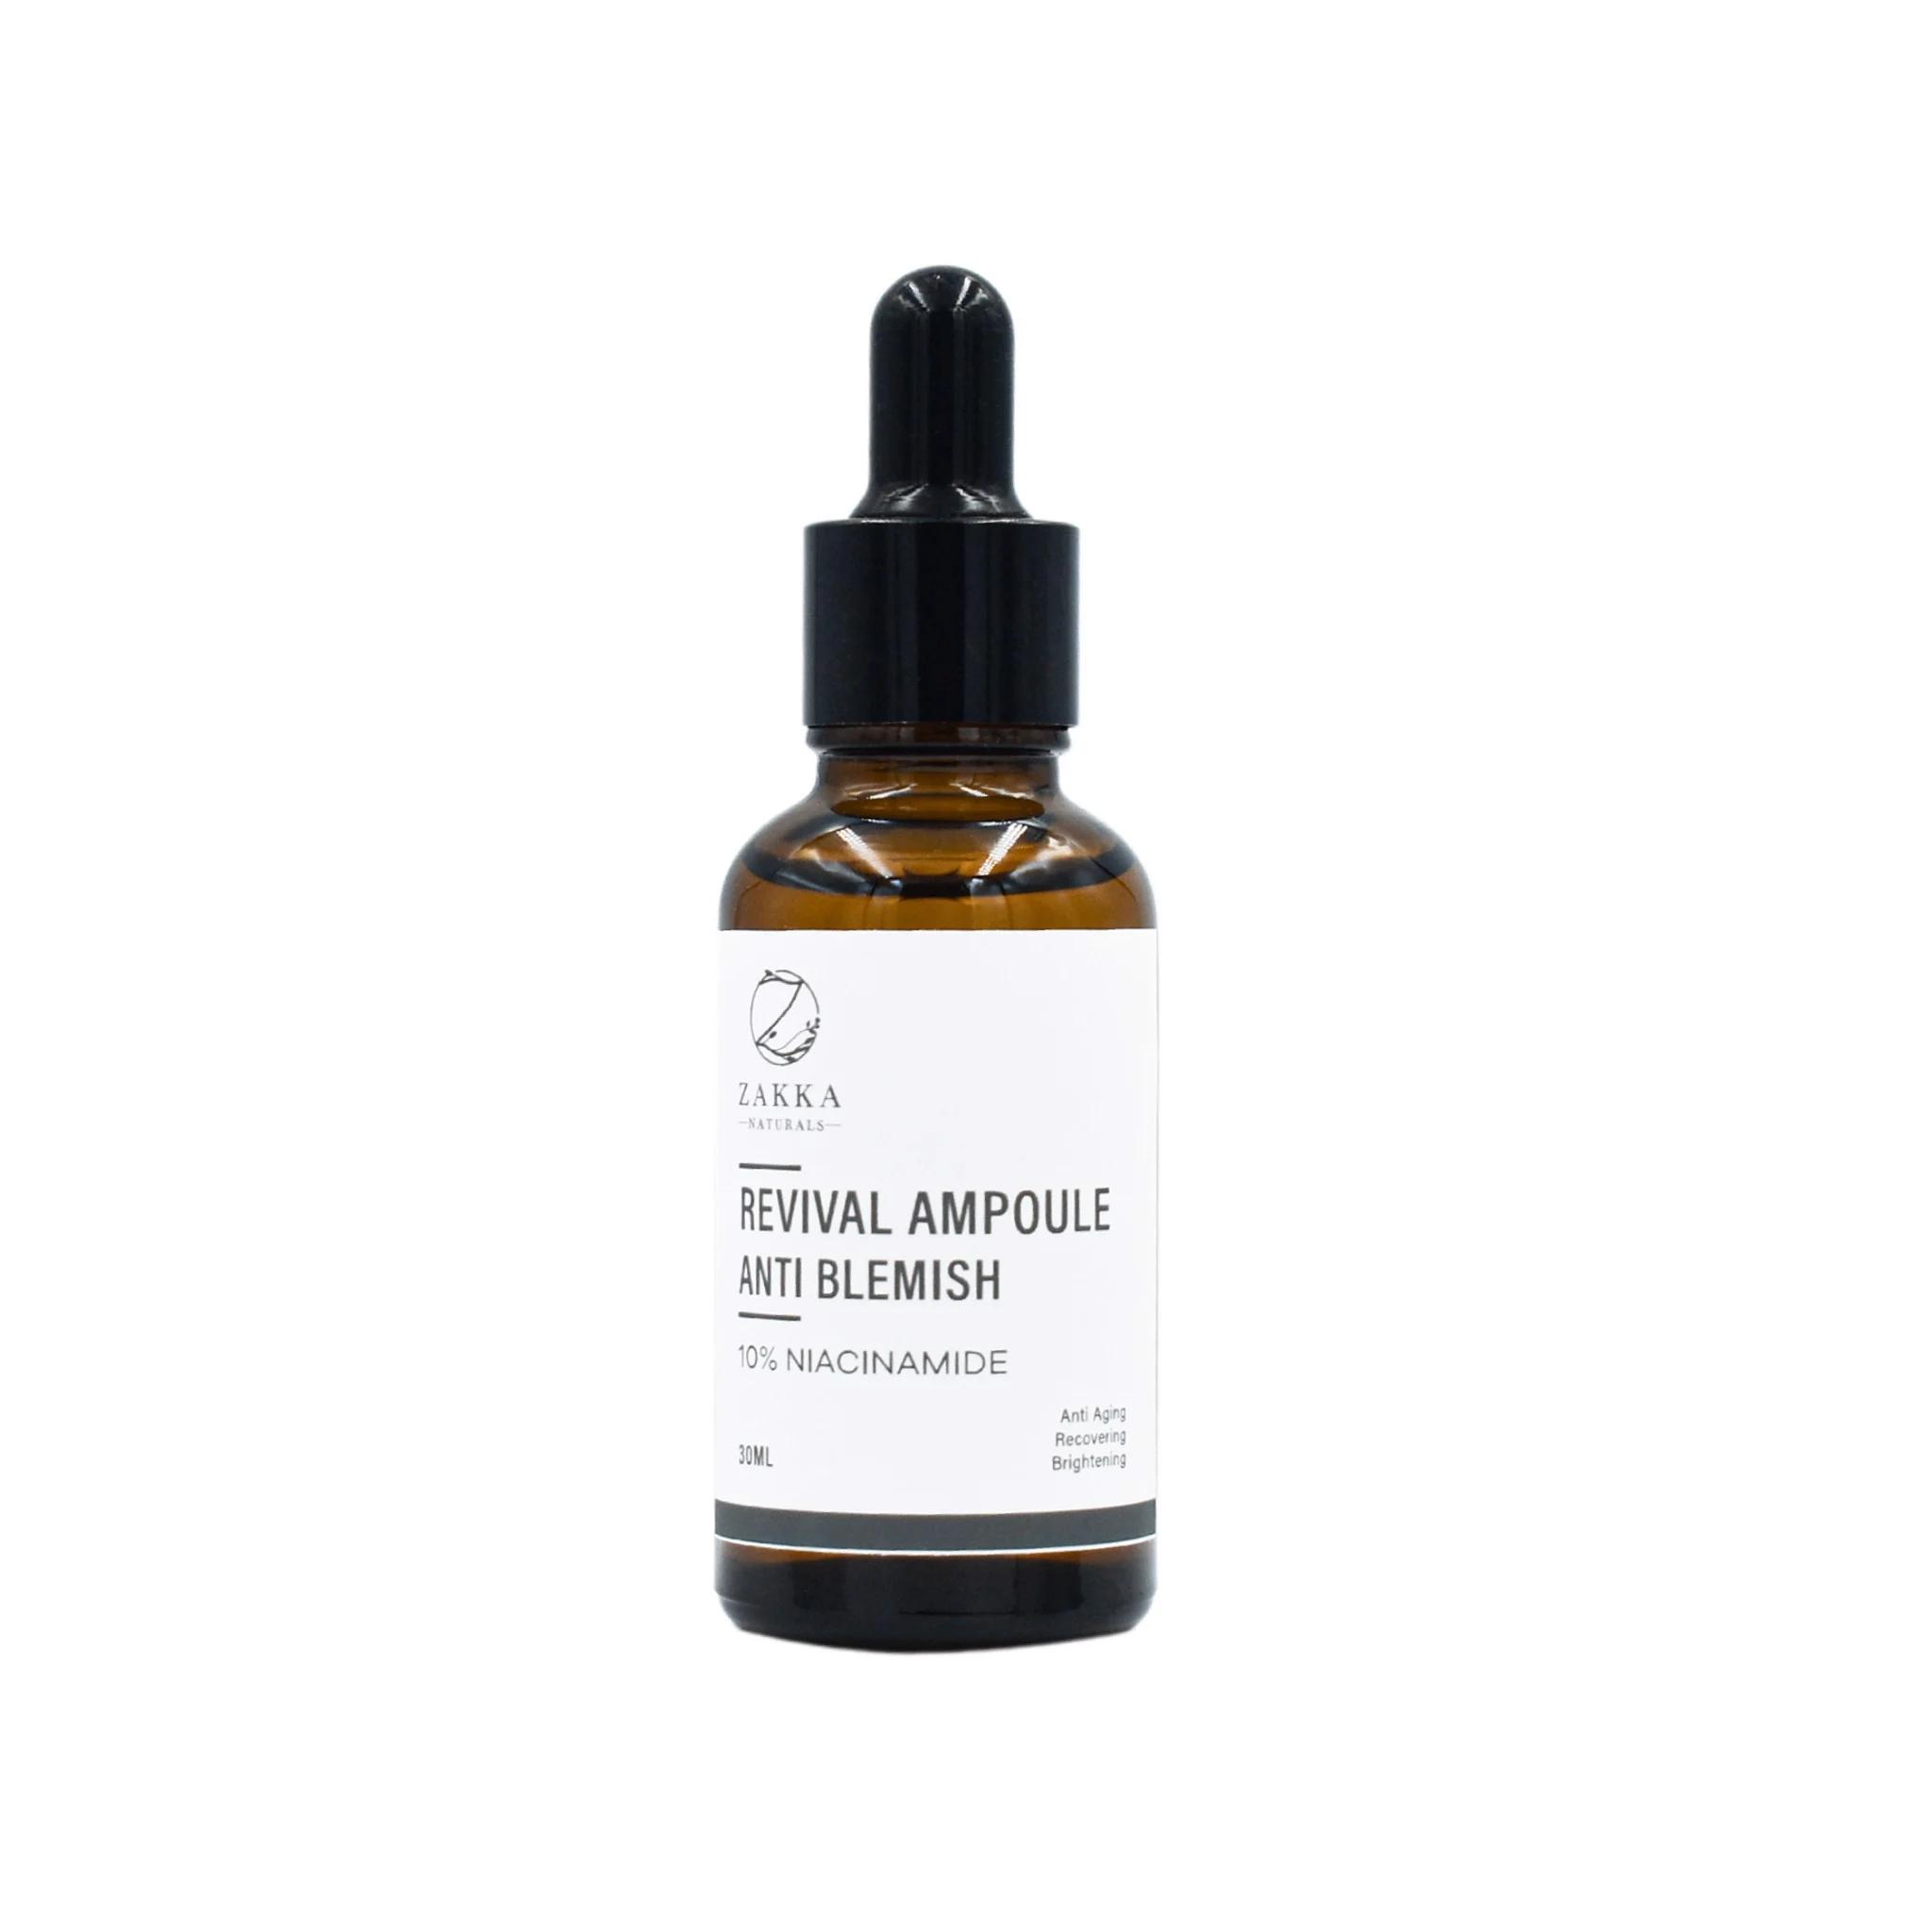 tinh-chat-duong-da-zakka-naturals-revival-ampoule-anti-blemish-10-niacinamide-review-thanh-phan-gia-cong-dung